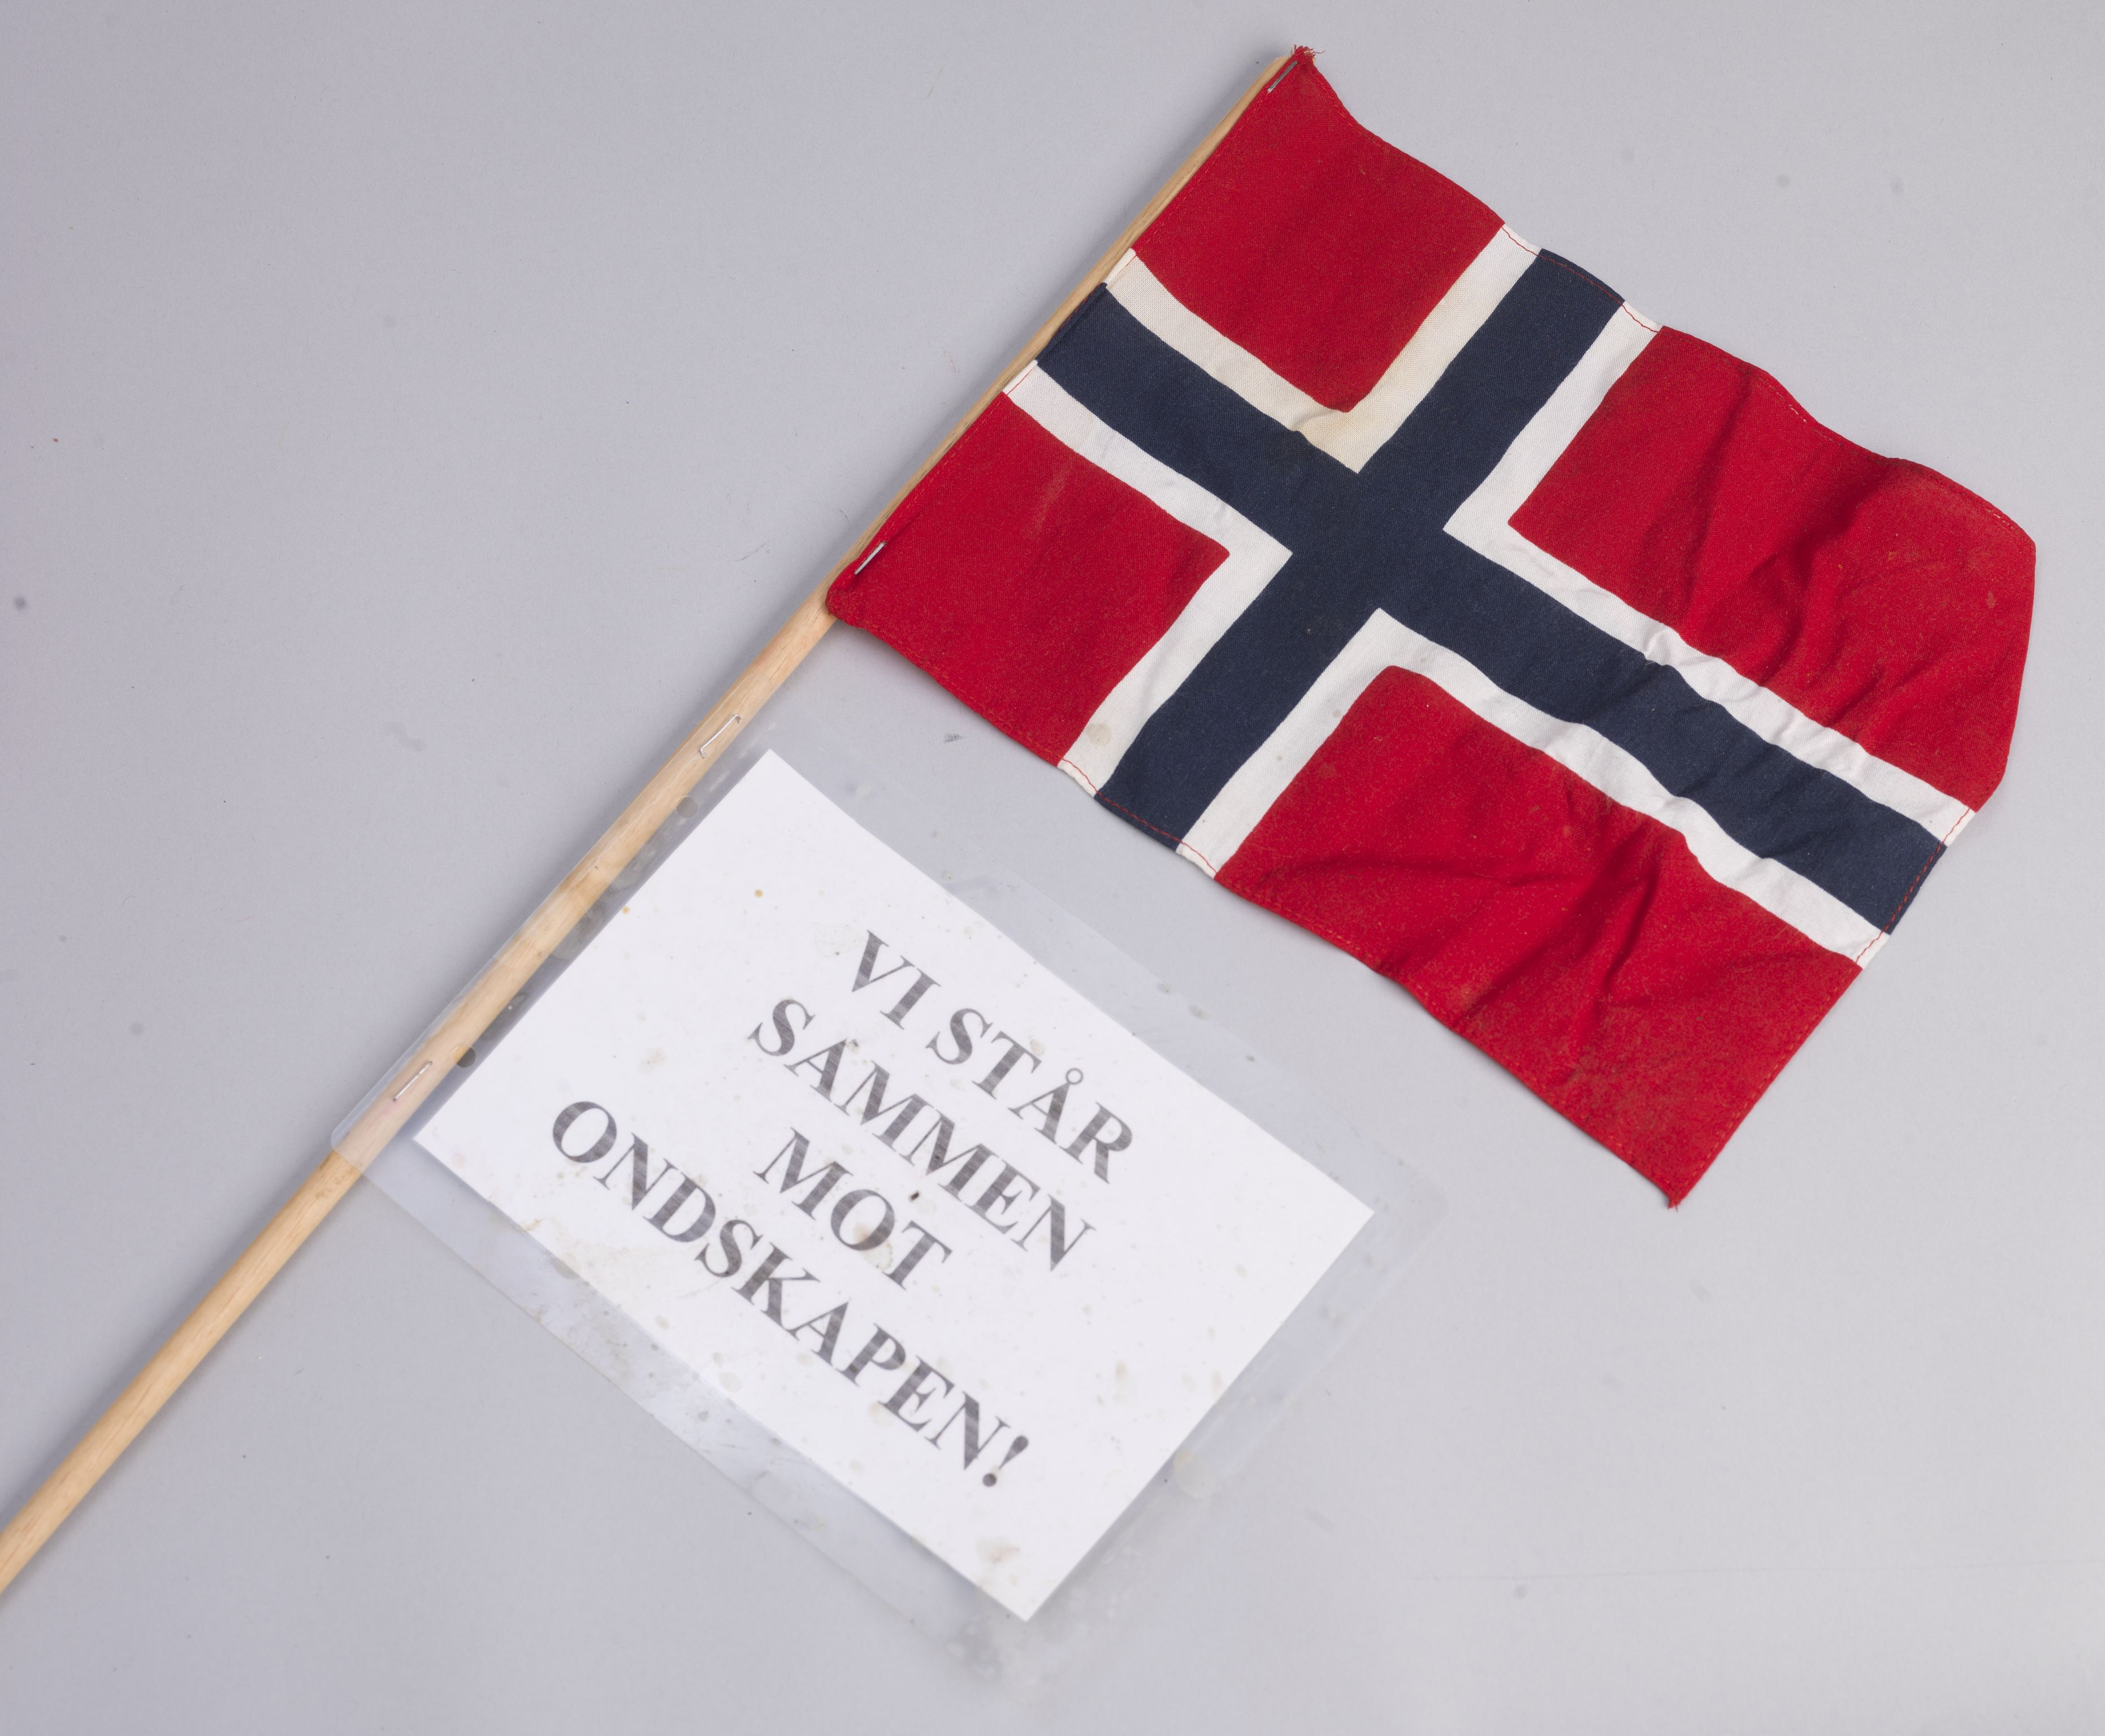 RA, Minnemateriale etter 22.07.2011, W/Wc/L0011: Oslo domkirke. Norske flagg med påtegnelser, 2011, s. 1